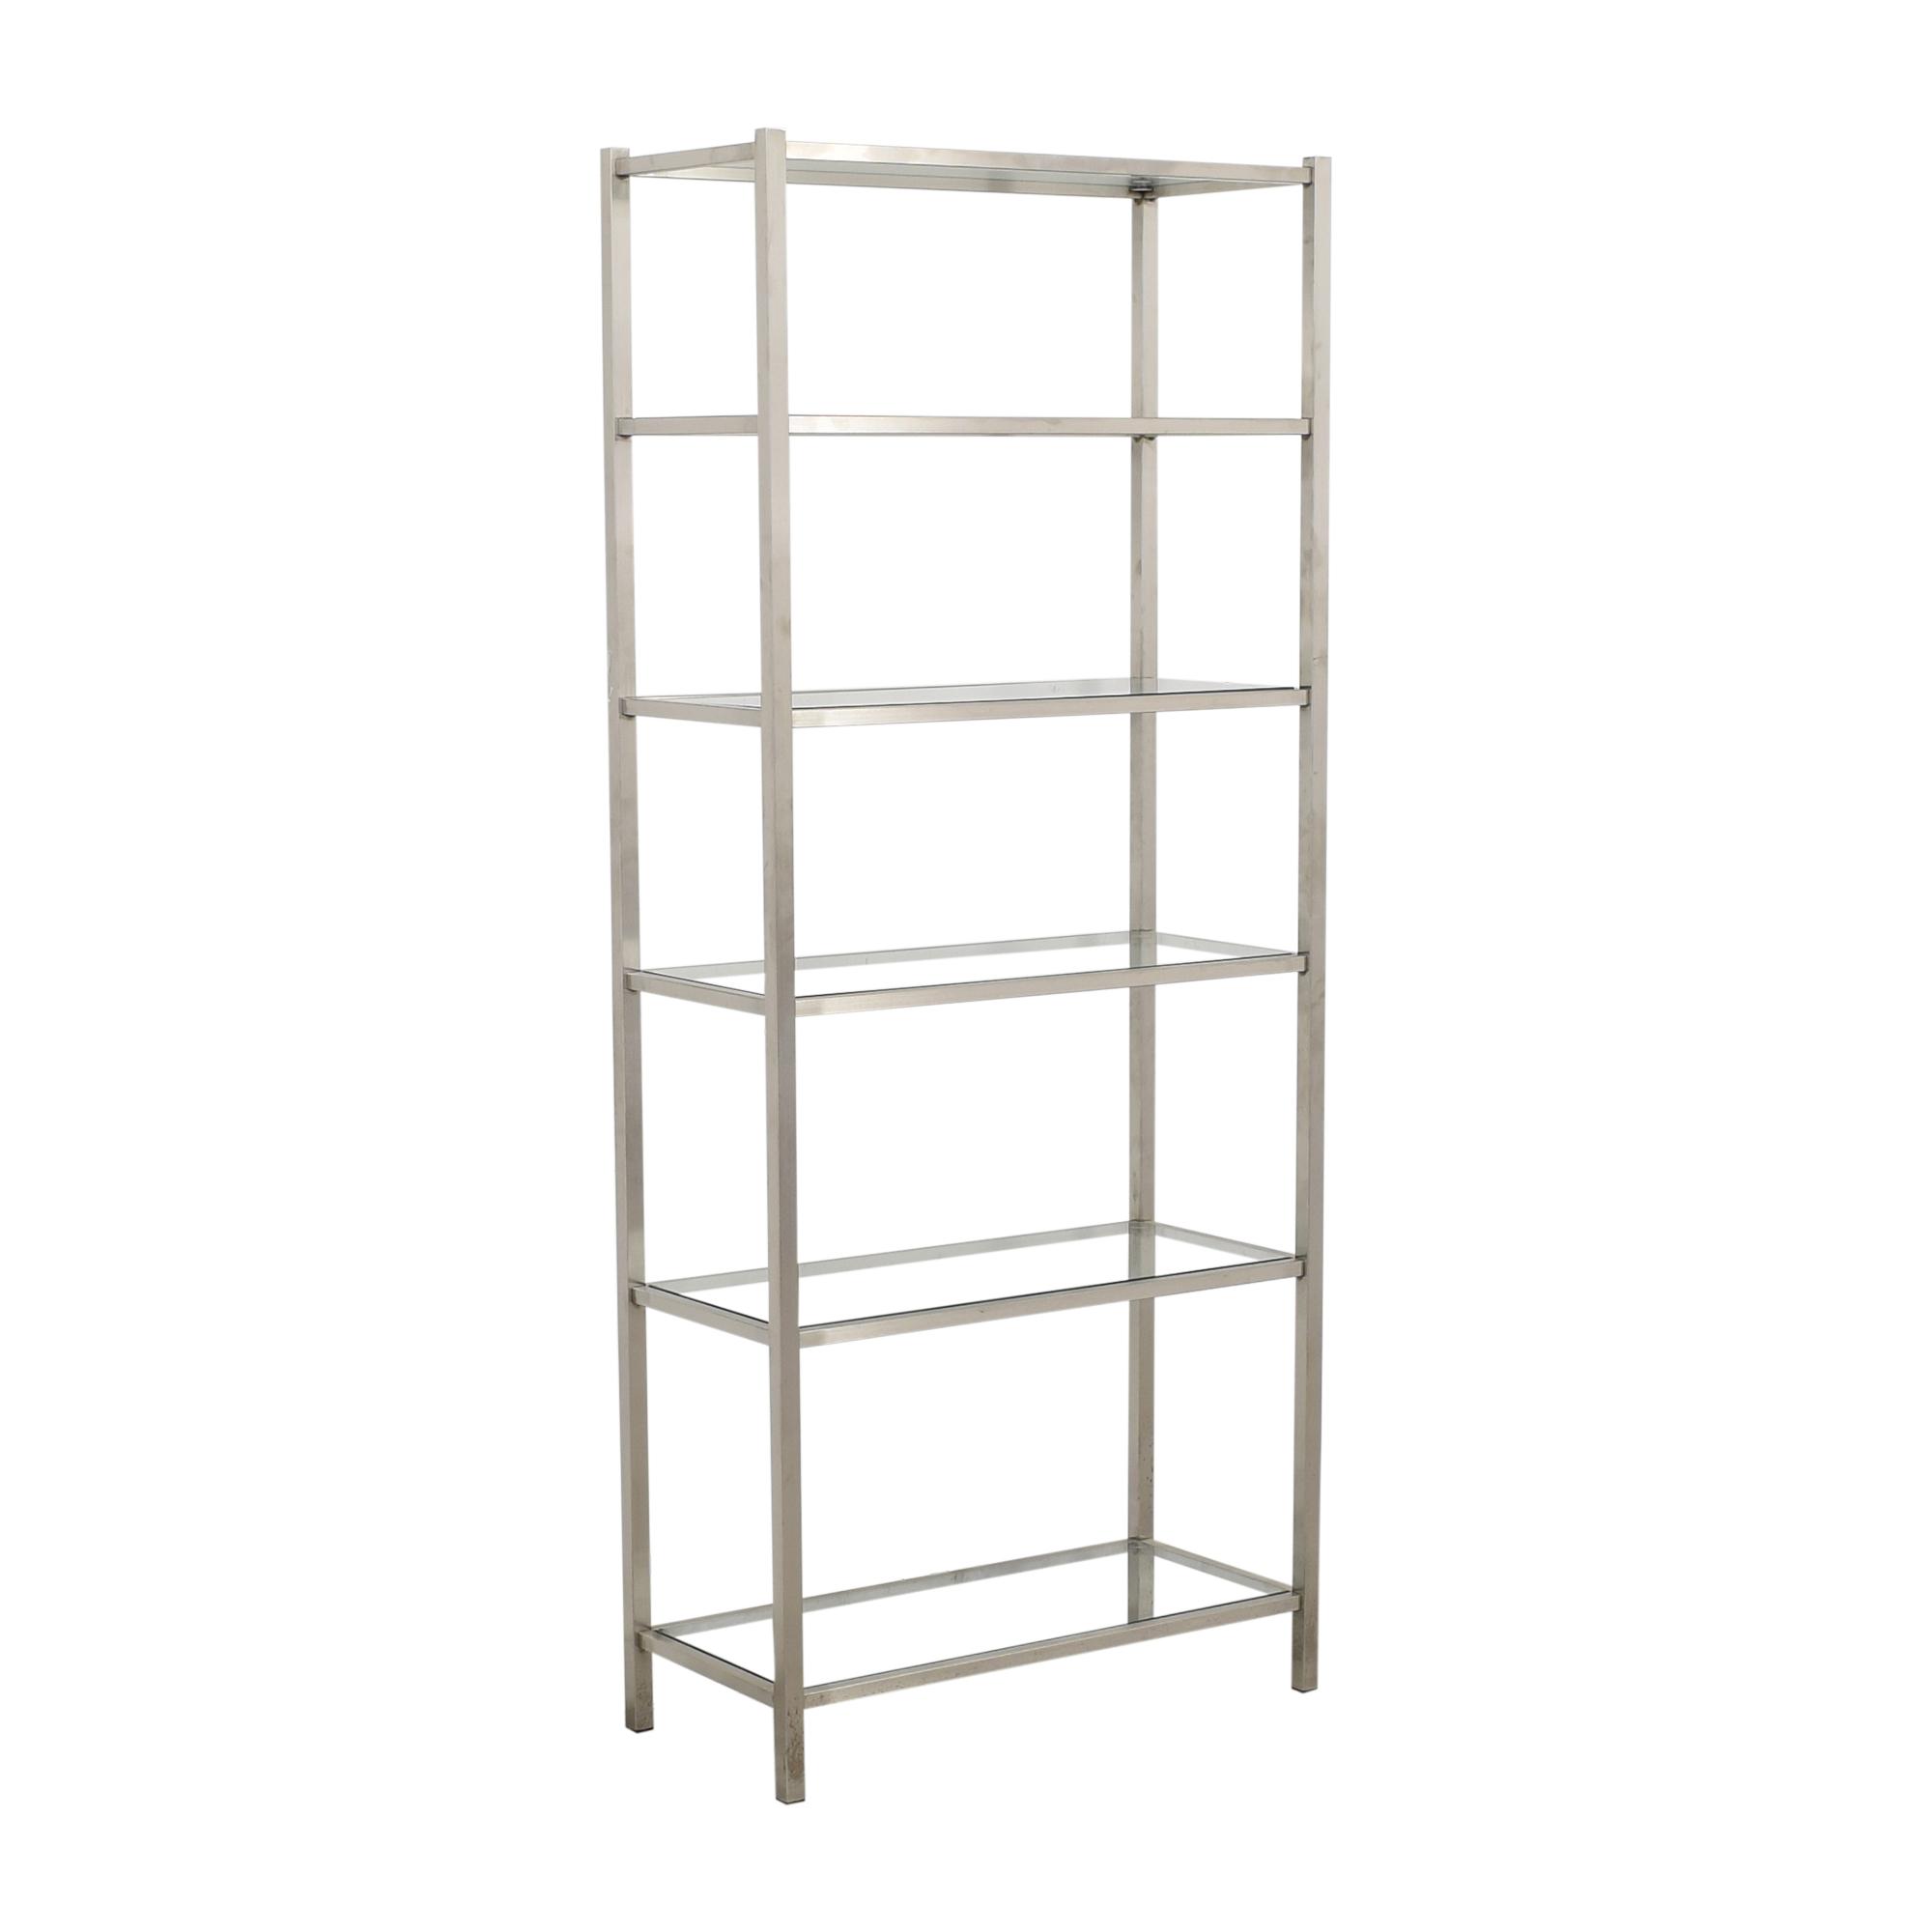 buy Room & Board Brixton Bookcase Room & Board Bookcases & Shelving